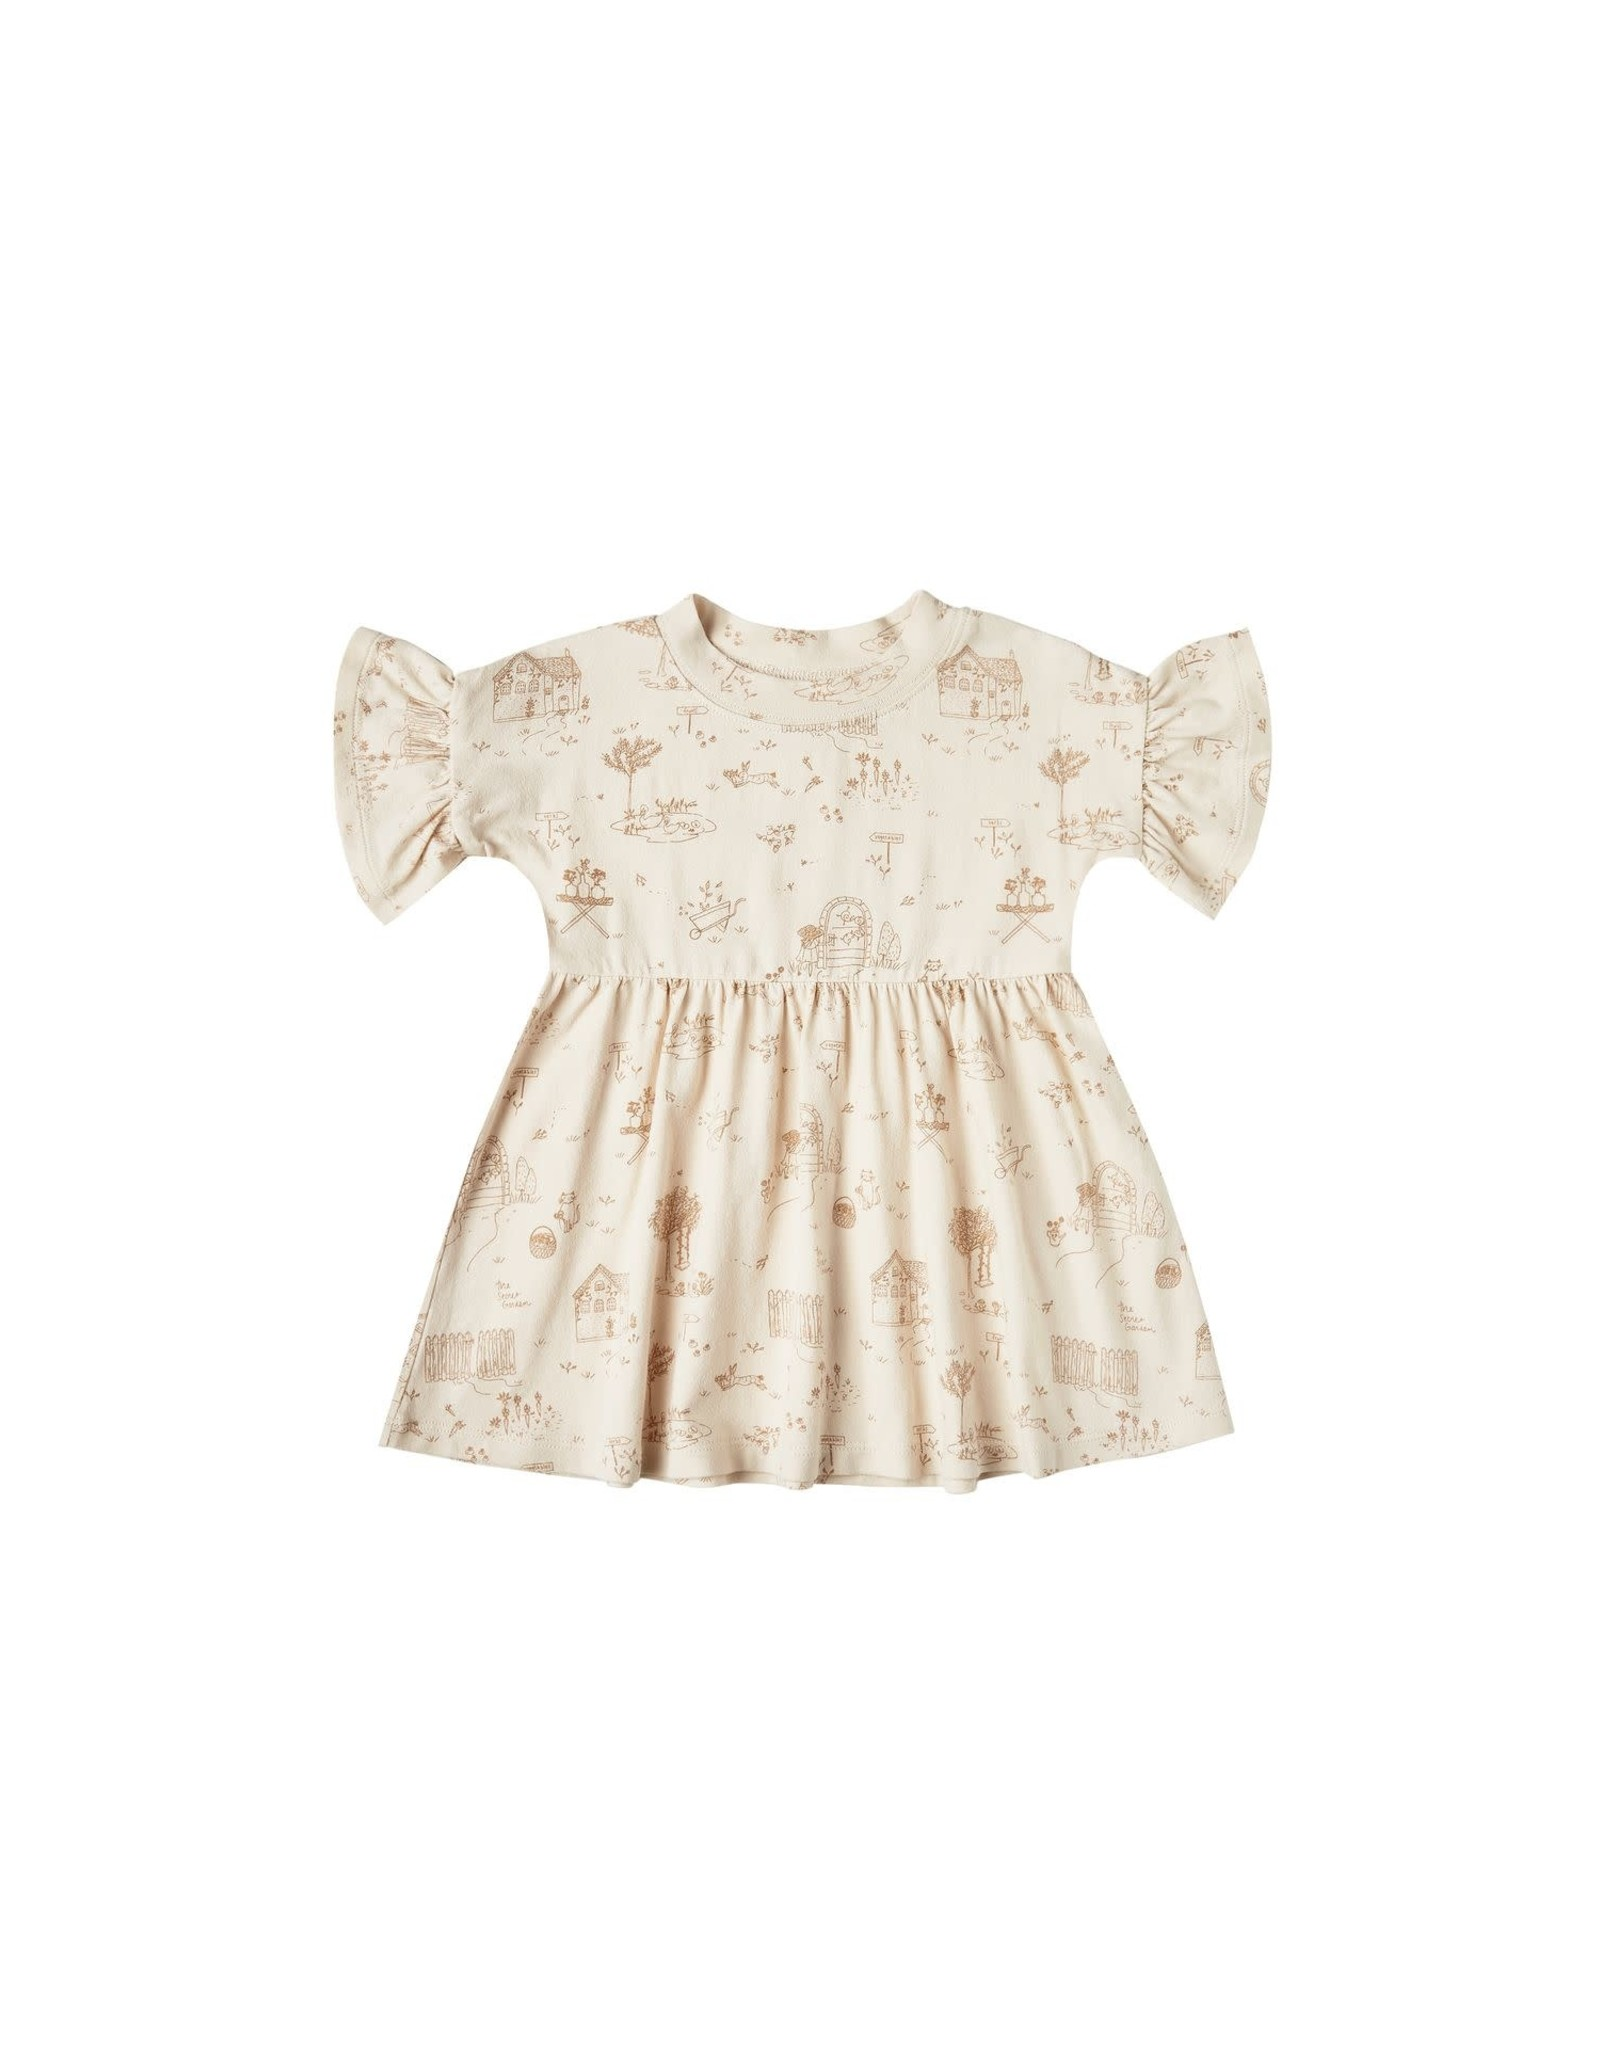 Rylee and Cru secret garden babydoll dress